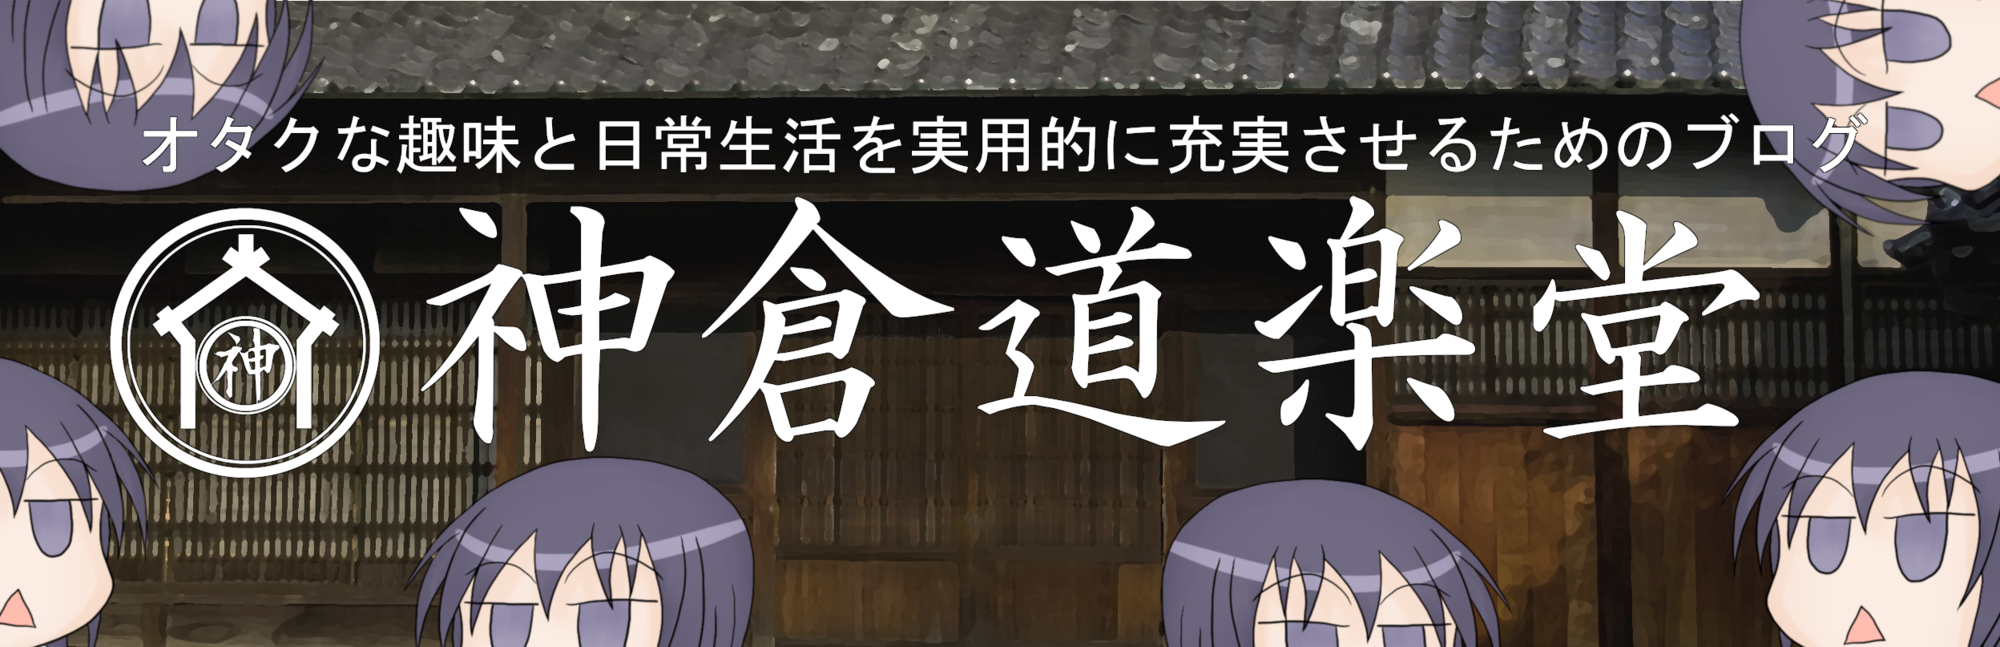 f:id:kamikura102:20180831055634p:plain